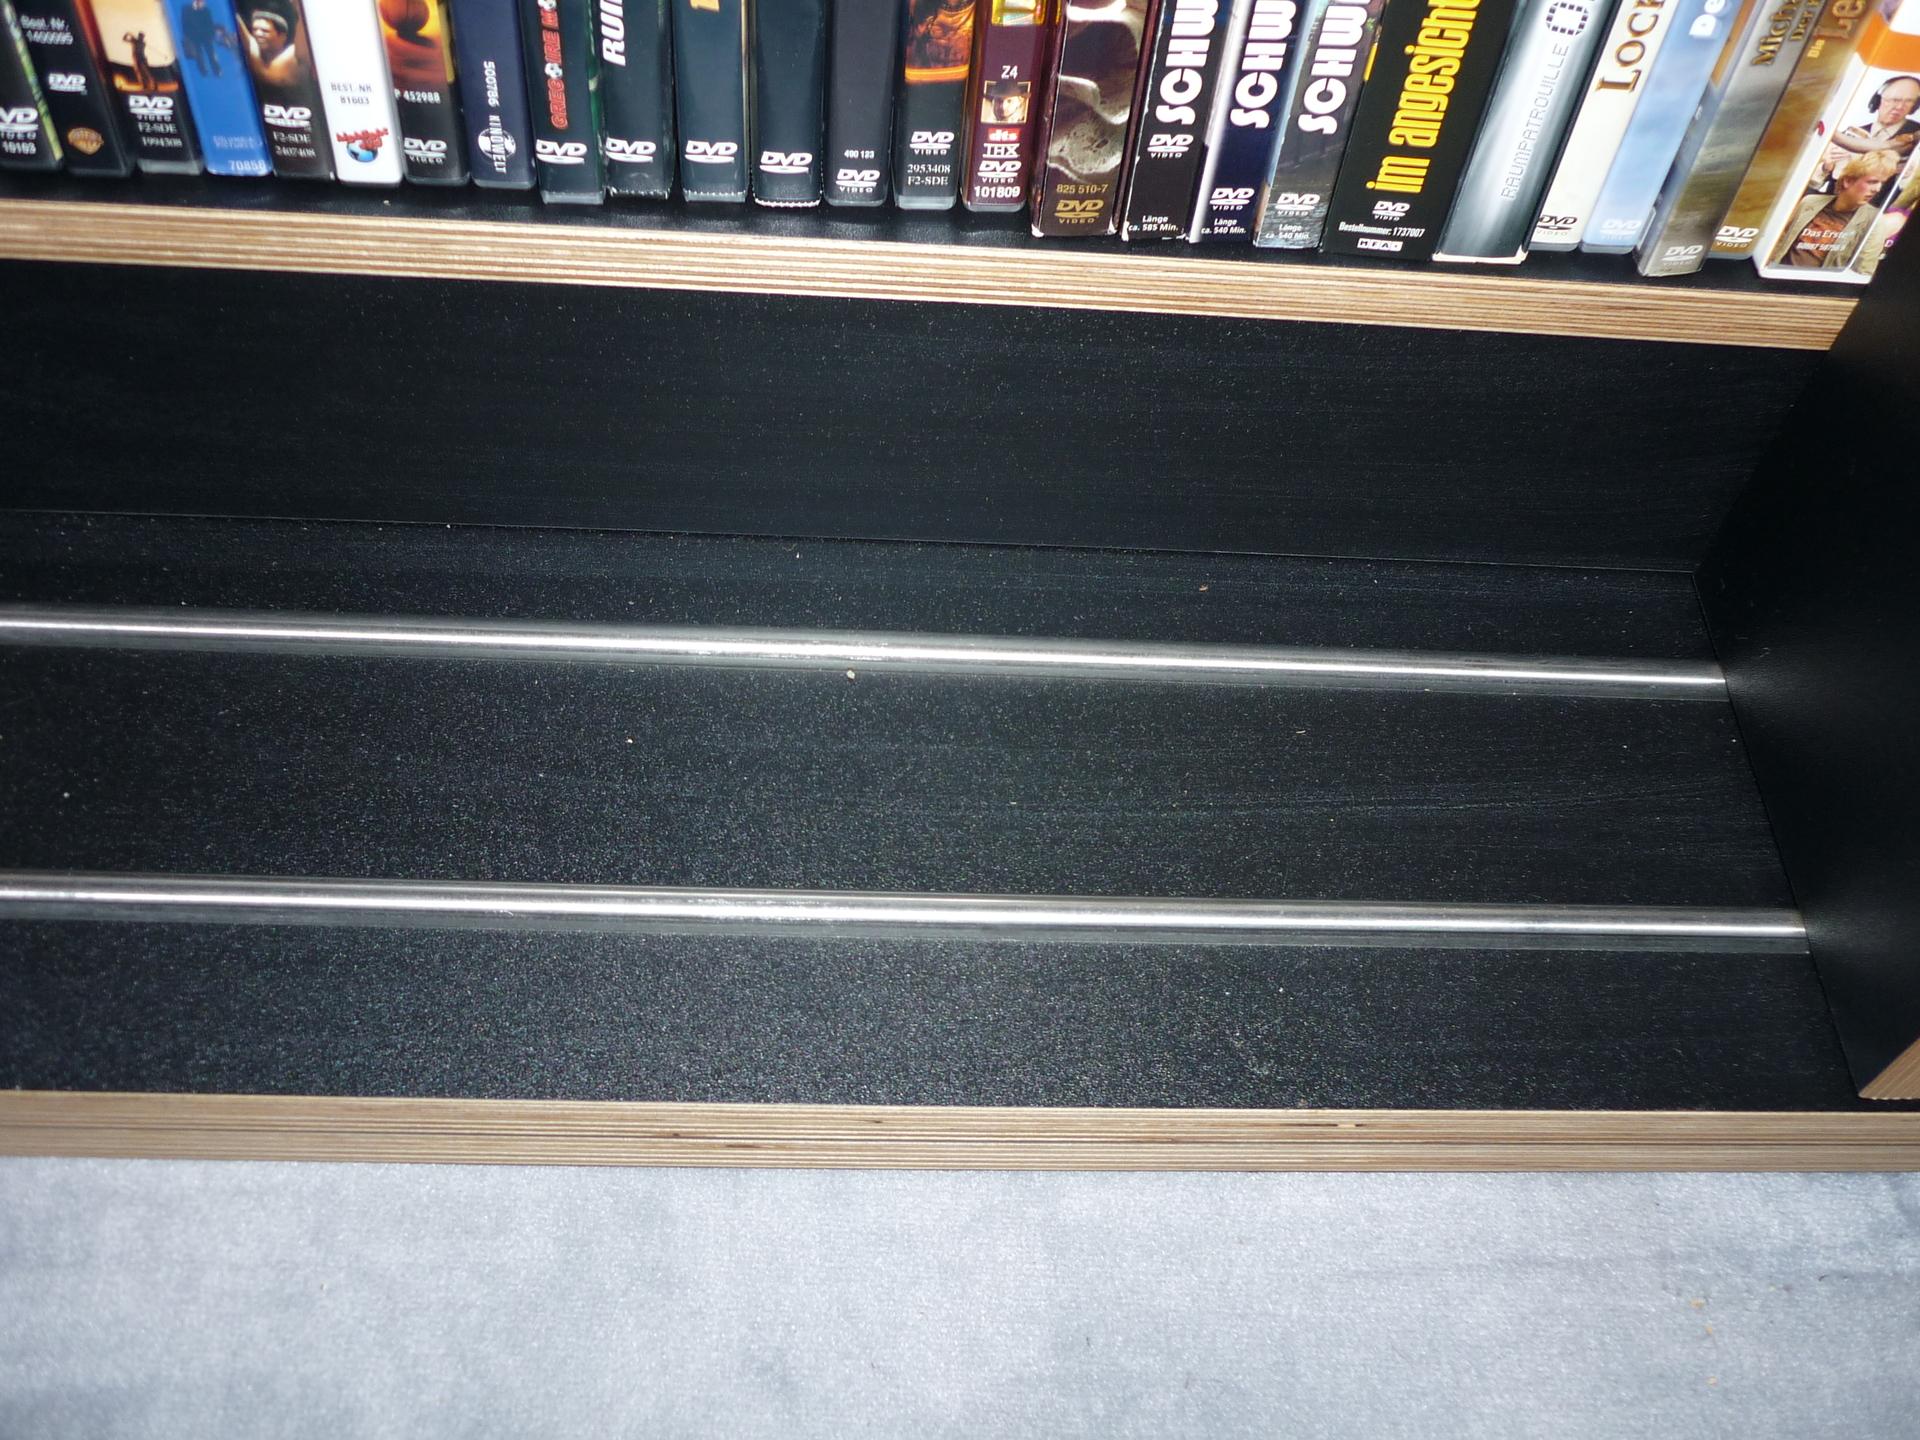 cd dvd blu ray regal blu cd dvd ray regal tuning. Black Bedroom Furniture Sets. Home Design Ideas